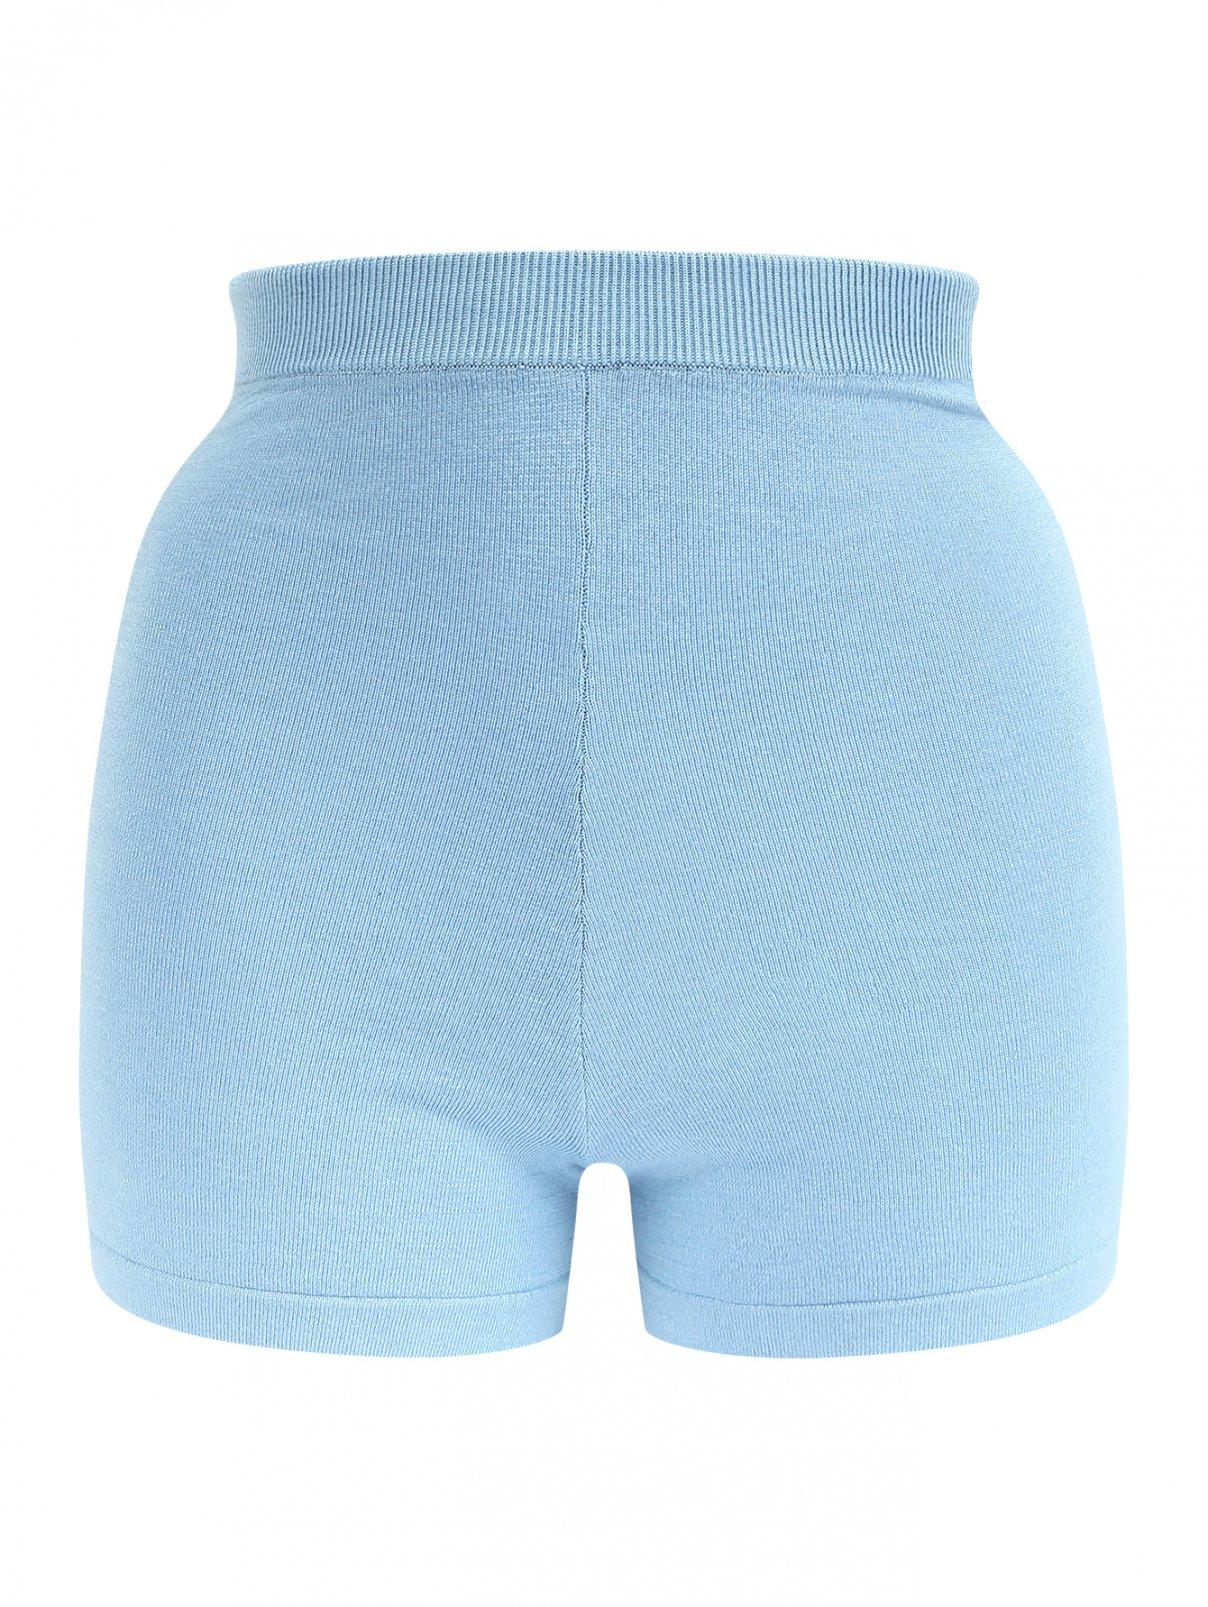 Панталоны из шелкового трикотажа La Perla  –  Общий вид